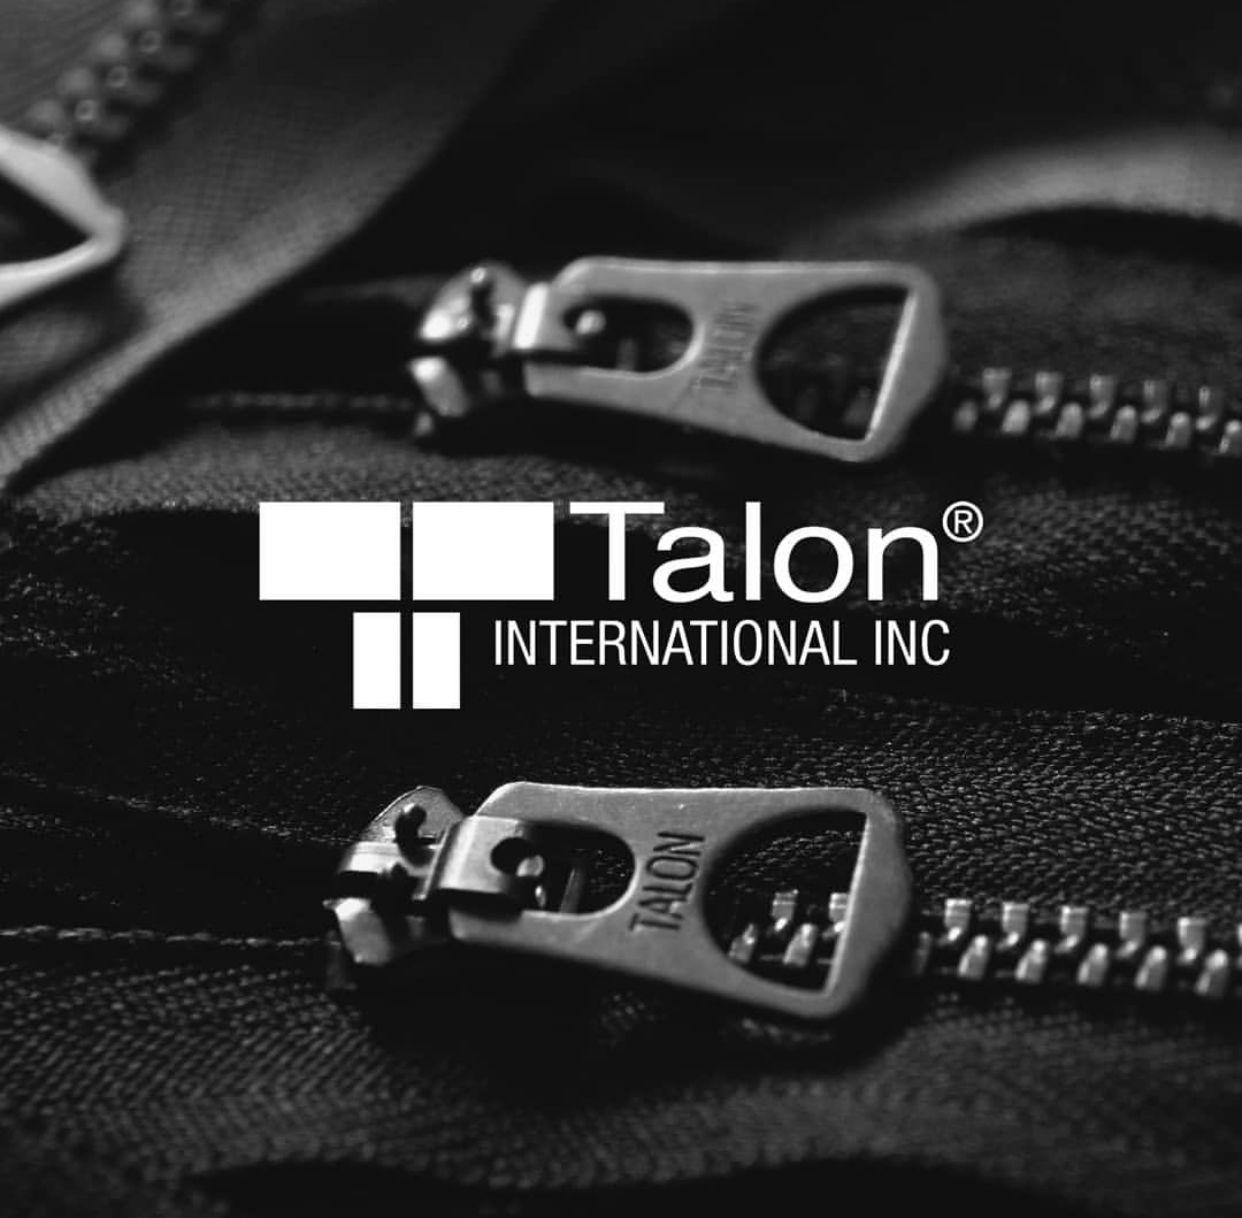 Metal Zippers In 2020 Metal Zipper Personalized Items